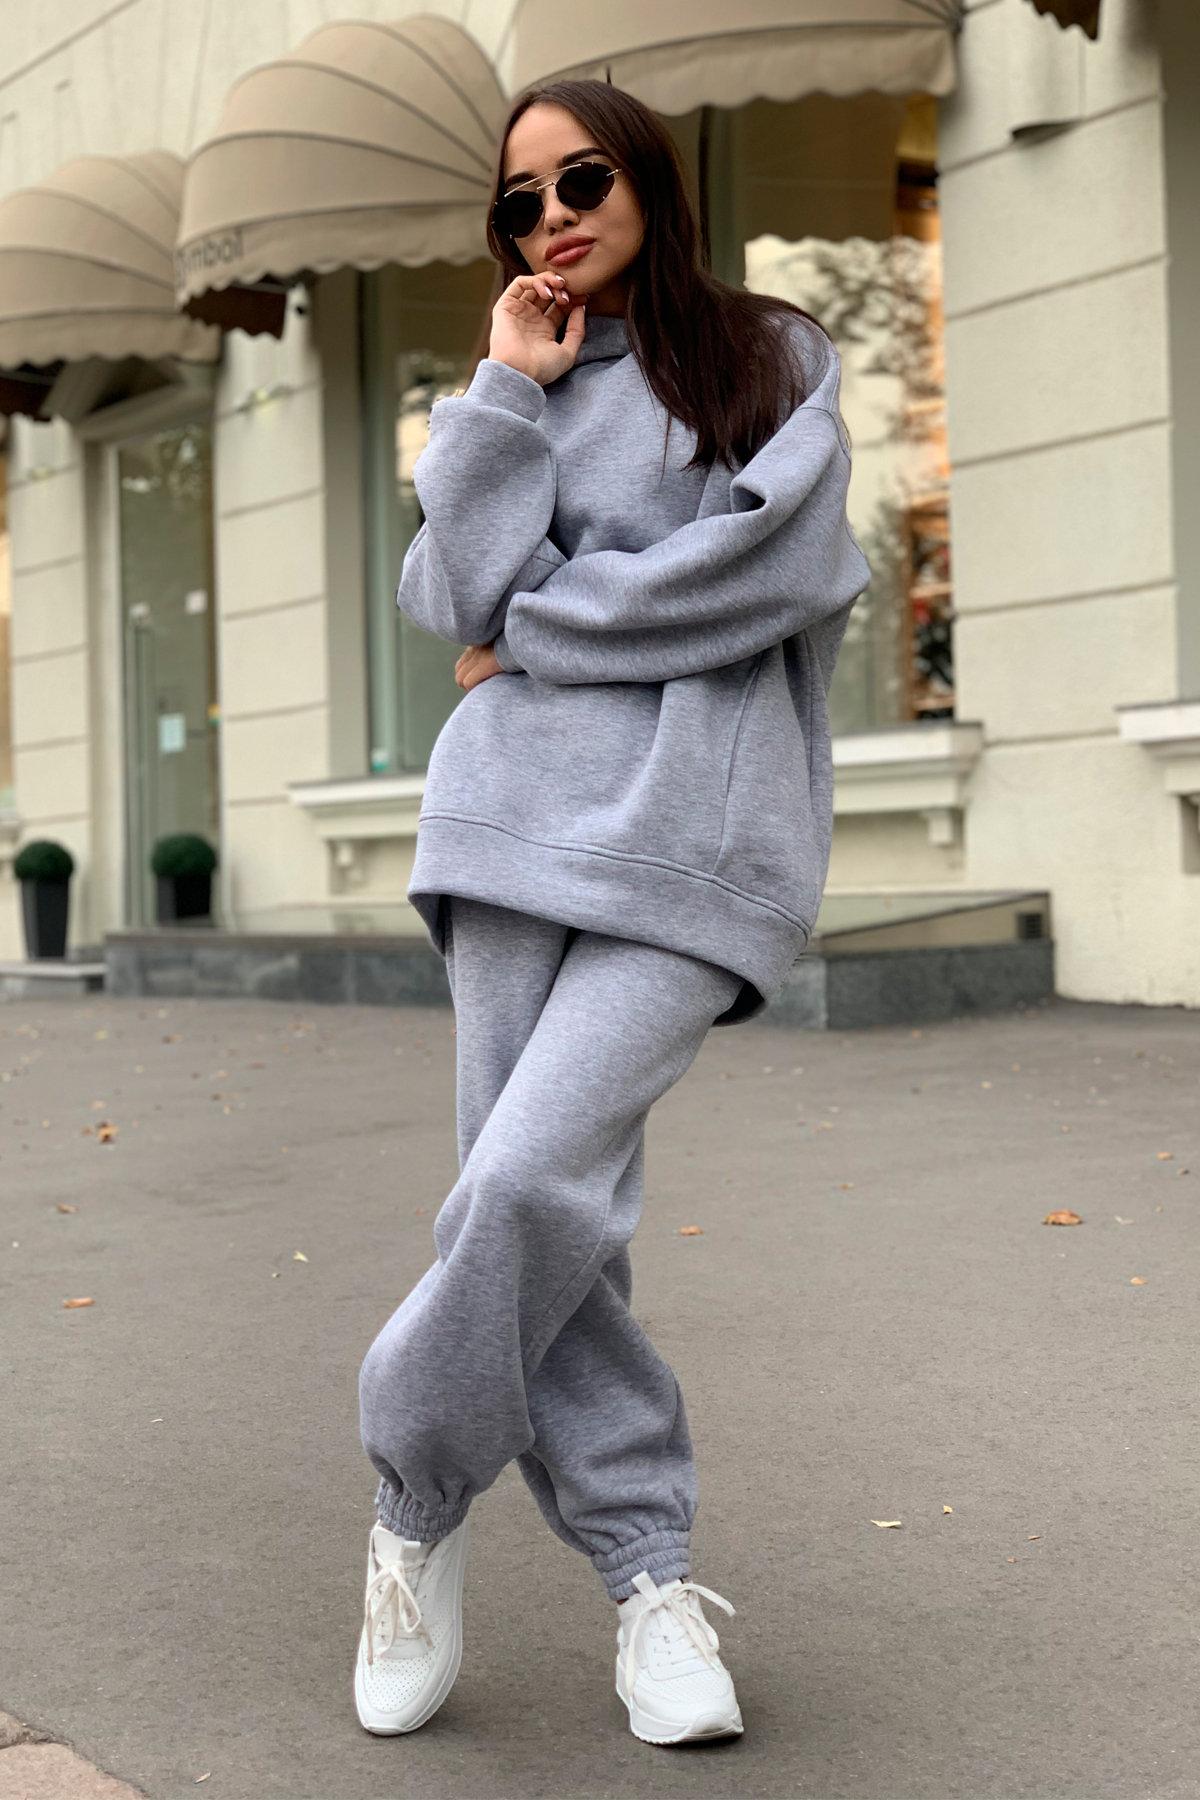 Костюм Марион 9651 АРТ. 45985 Цвет: св.серый меланж - фото 2, интернет магазин tm-modus.ru